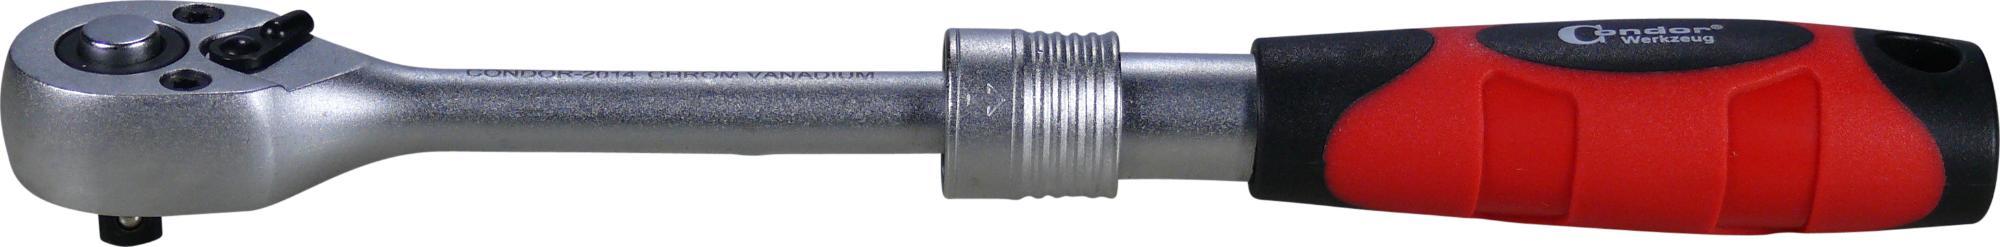 "Račňa teleskopická, 1/4"", 150-200 mm"